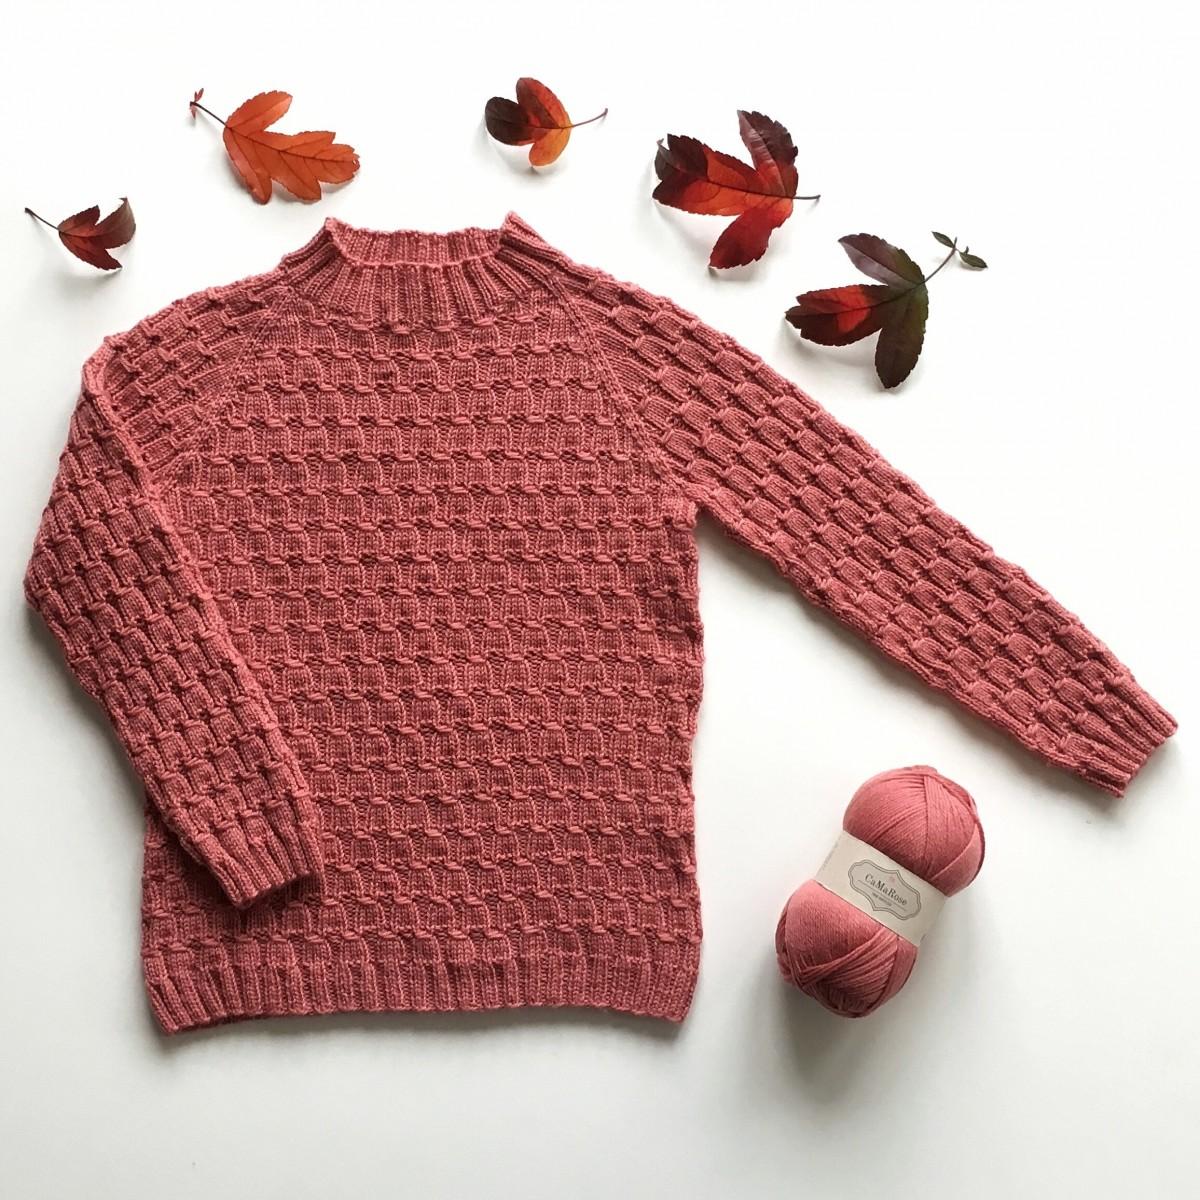 Viggos sweater